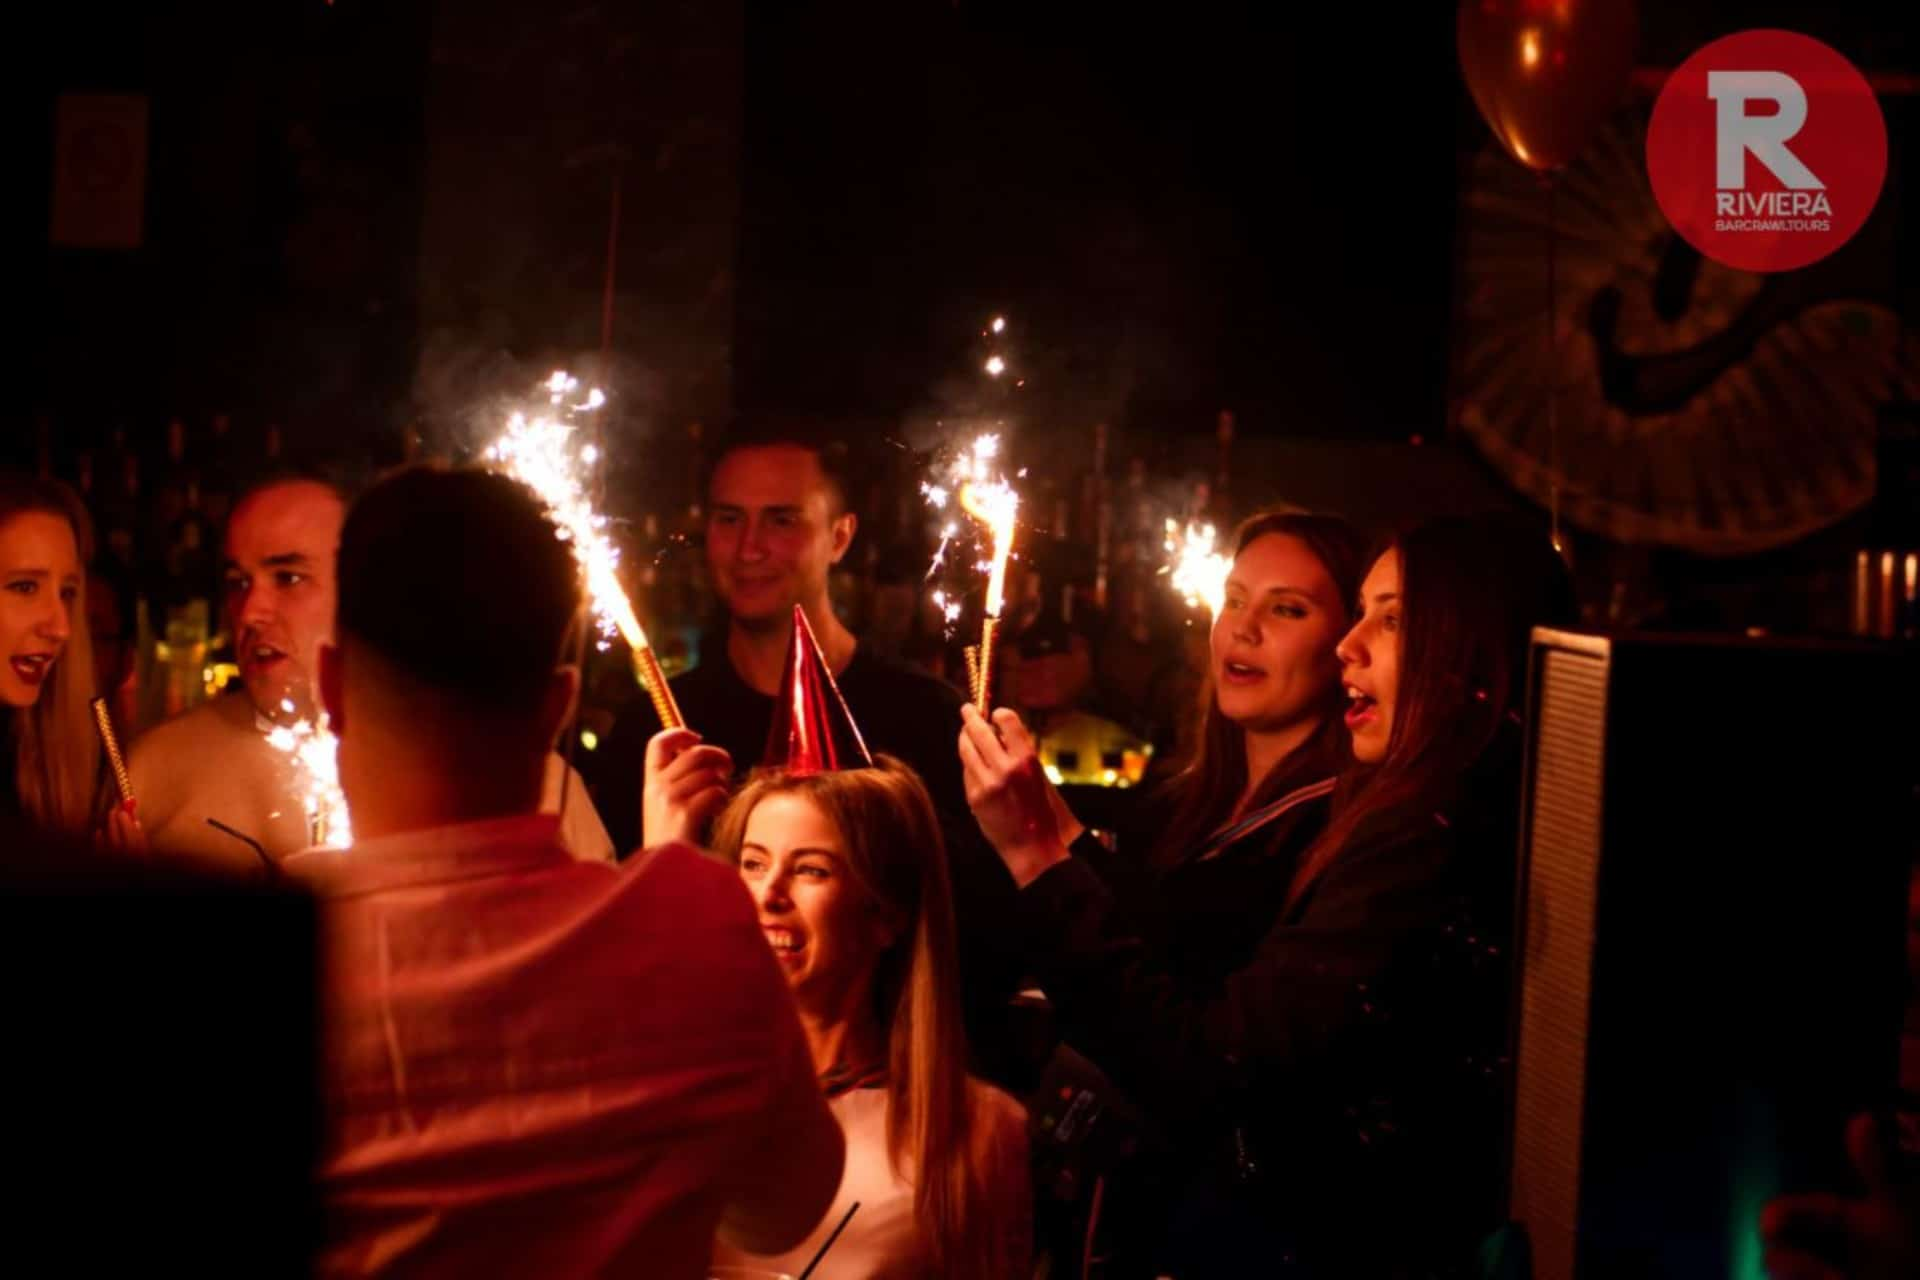 Wo man in Nizza feiern kann Frankreich riviera bar crawl tours